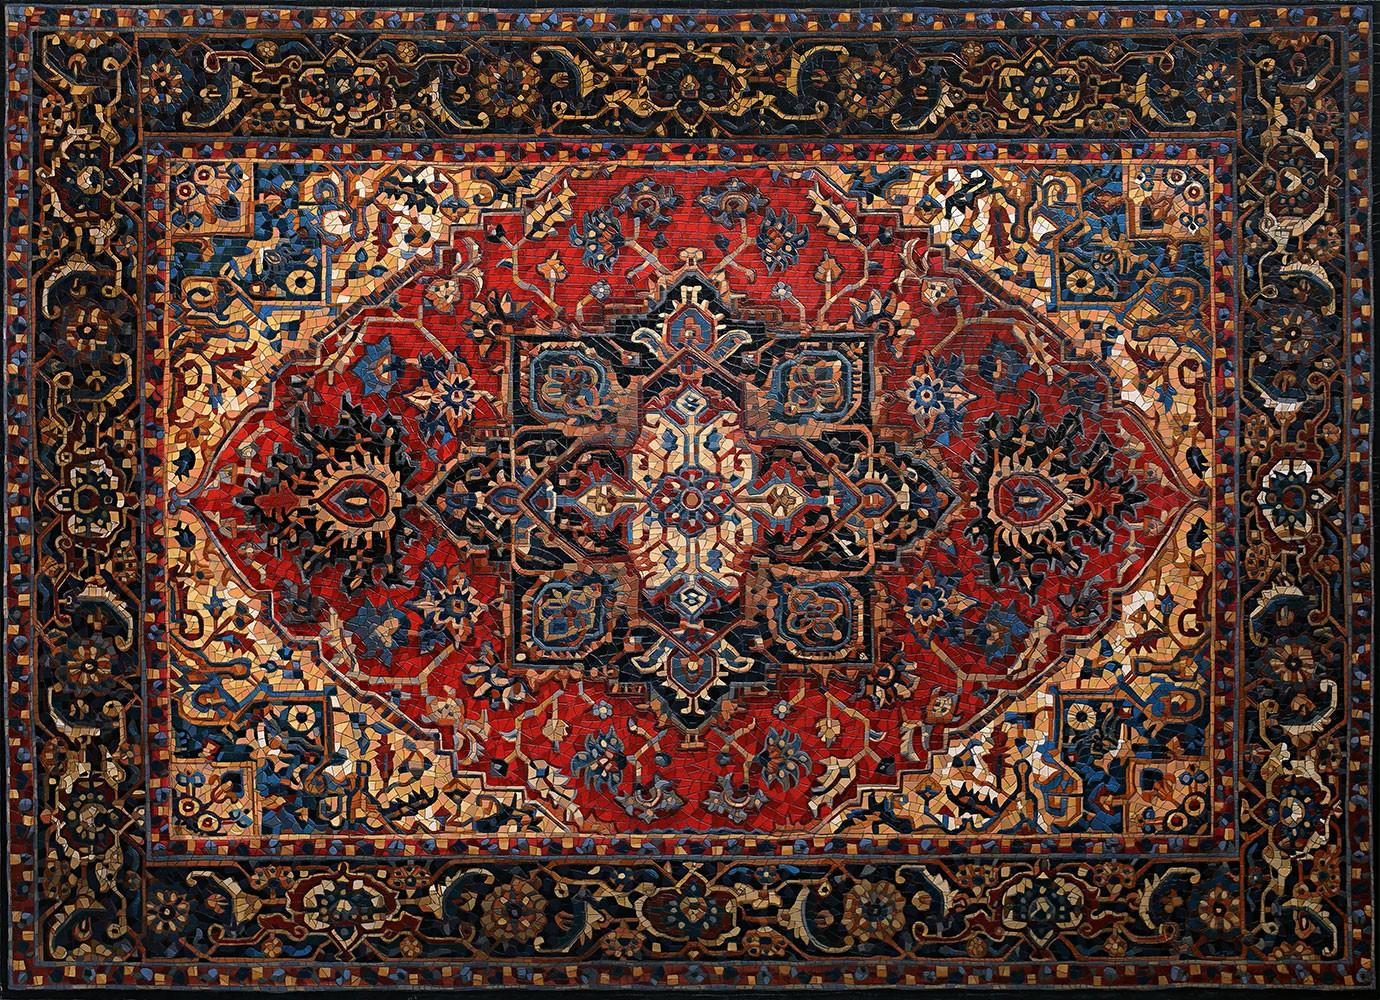 Wallpaper Symmetry Pattern Carpets Carpet Mosaic Art Design Floor Textile Flooring Tapestry 1380x1000 Lebowski 11062 Hd Wallpapers Wallhere